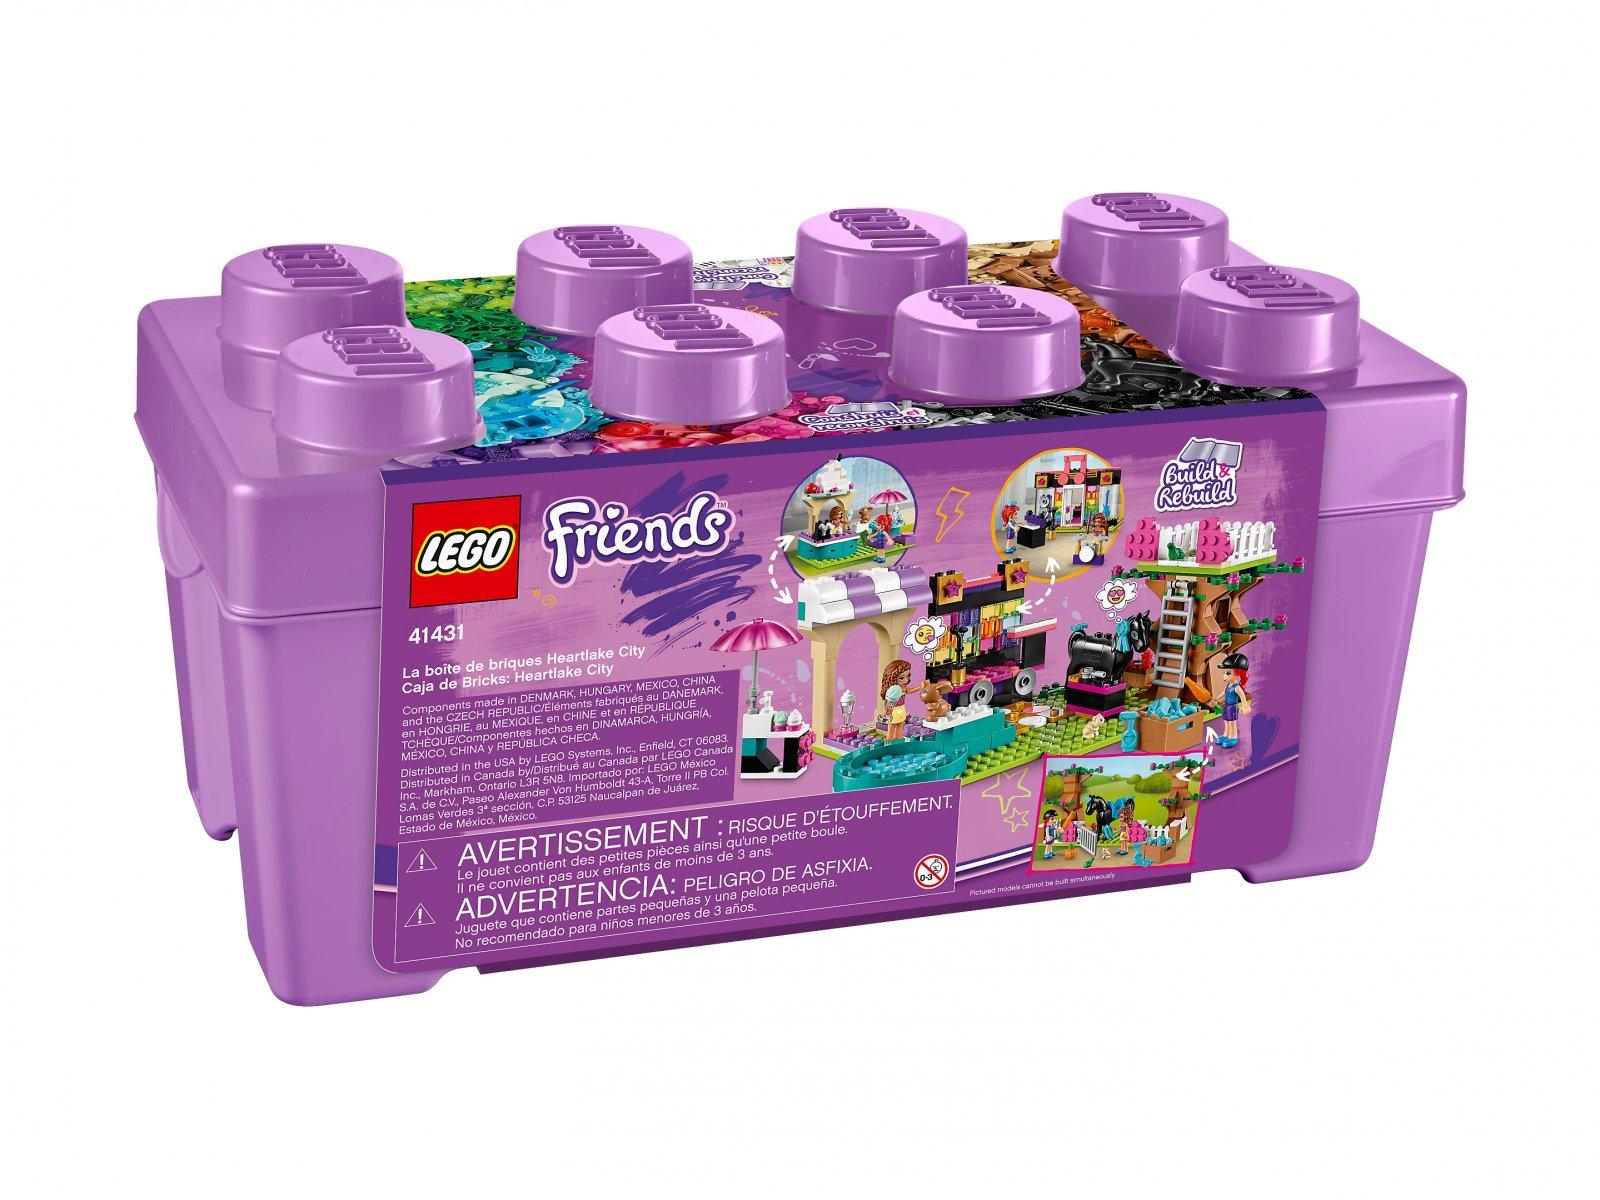 LEGO 41431 Friends Zestaw klocków Heartlake City